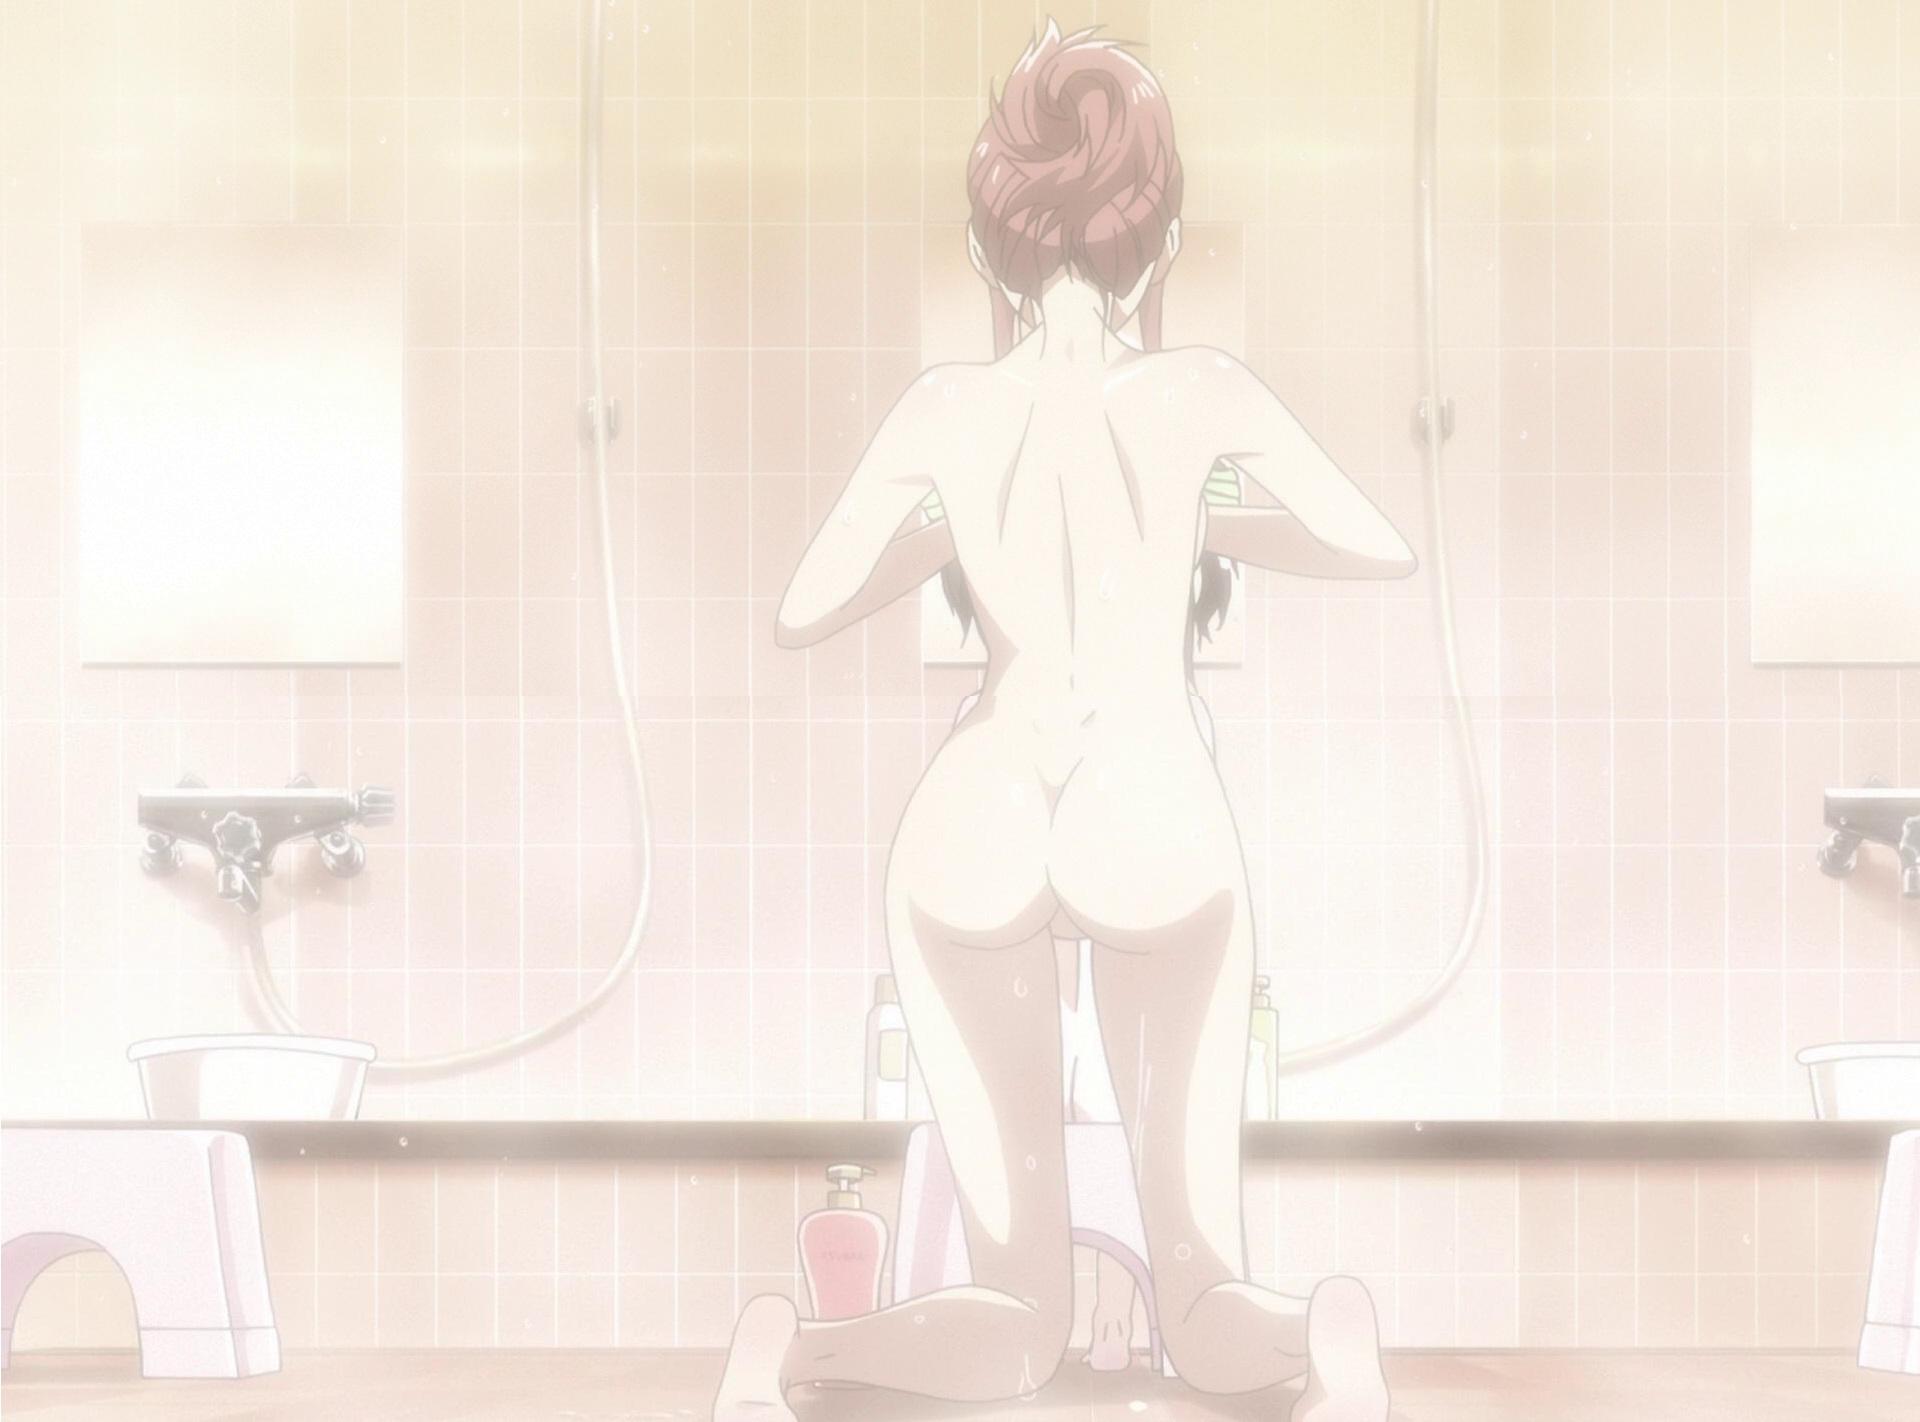 File Big Order Ova5 Jpg Anime Bath Scene Wiki